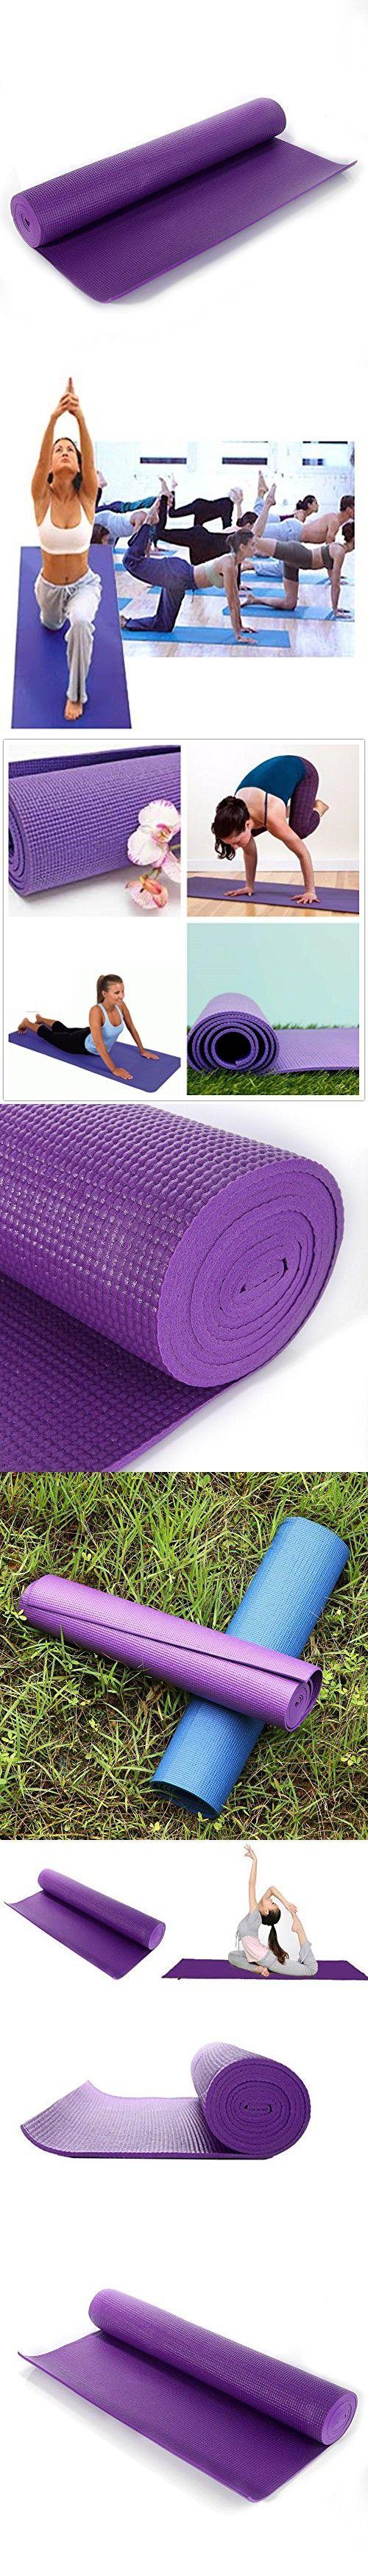 Evaline Extra Thick High exercise Anti-Slip Density Anti-Tear Exercise Foam Yoga Mat (Purple 6824inch)